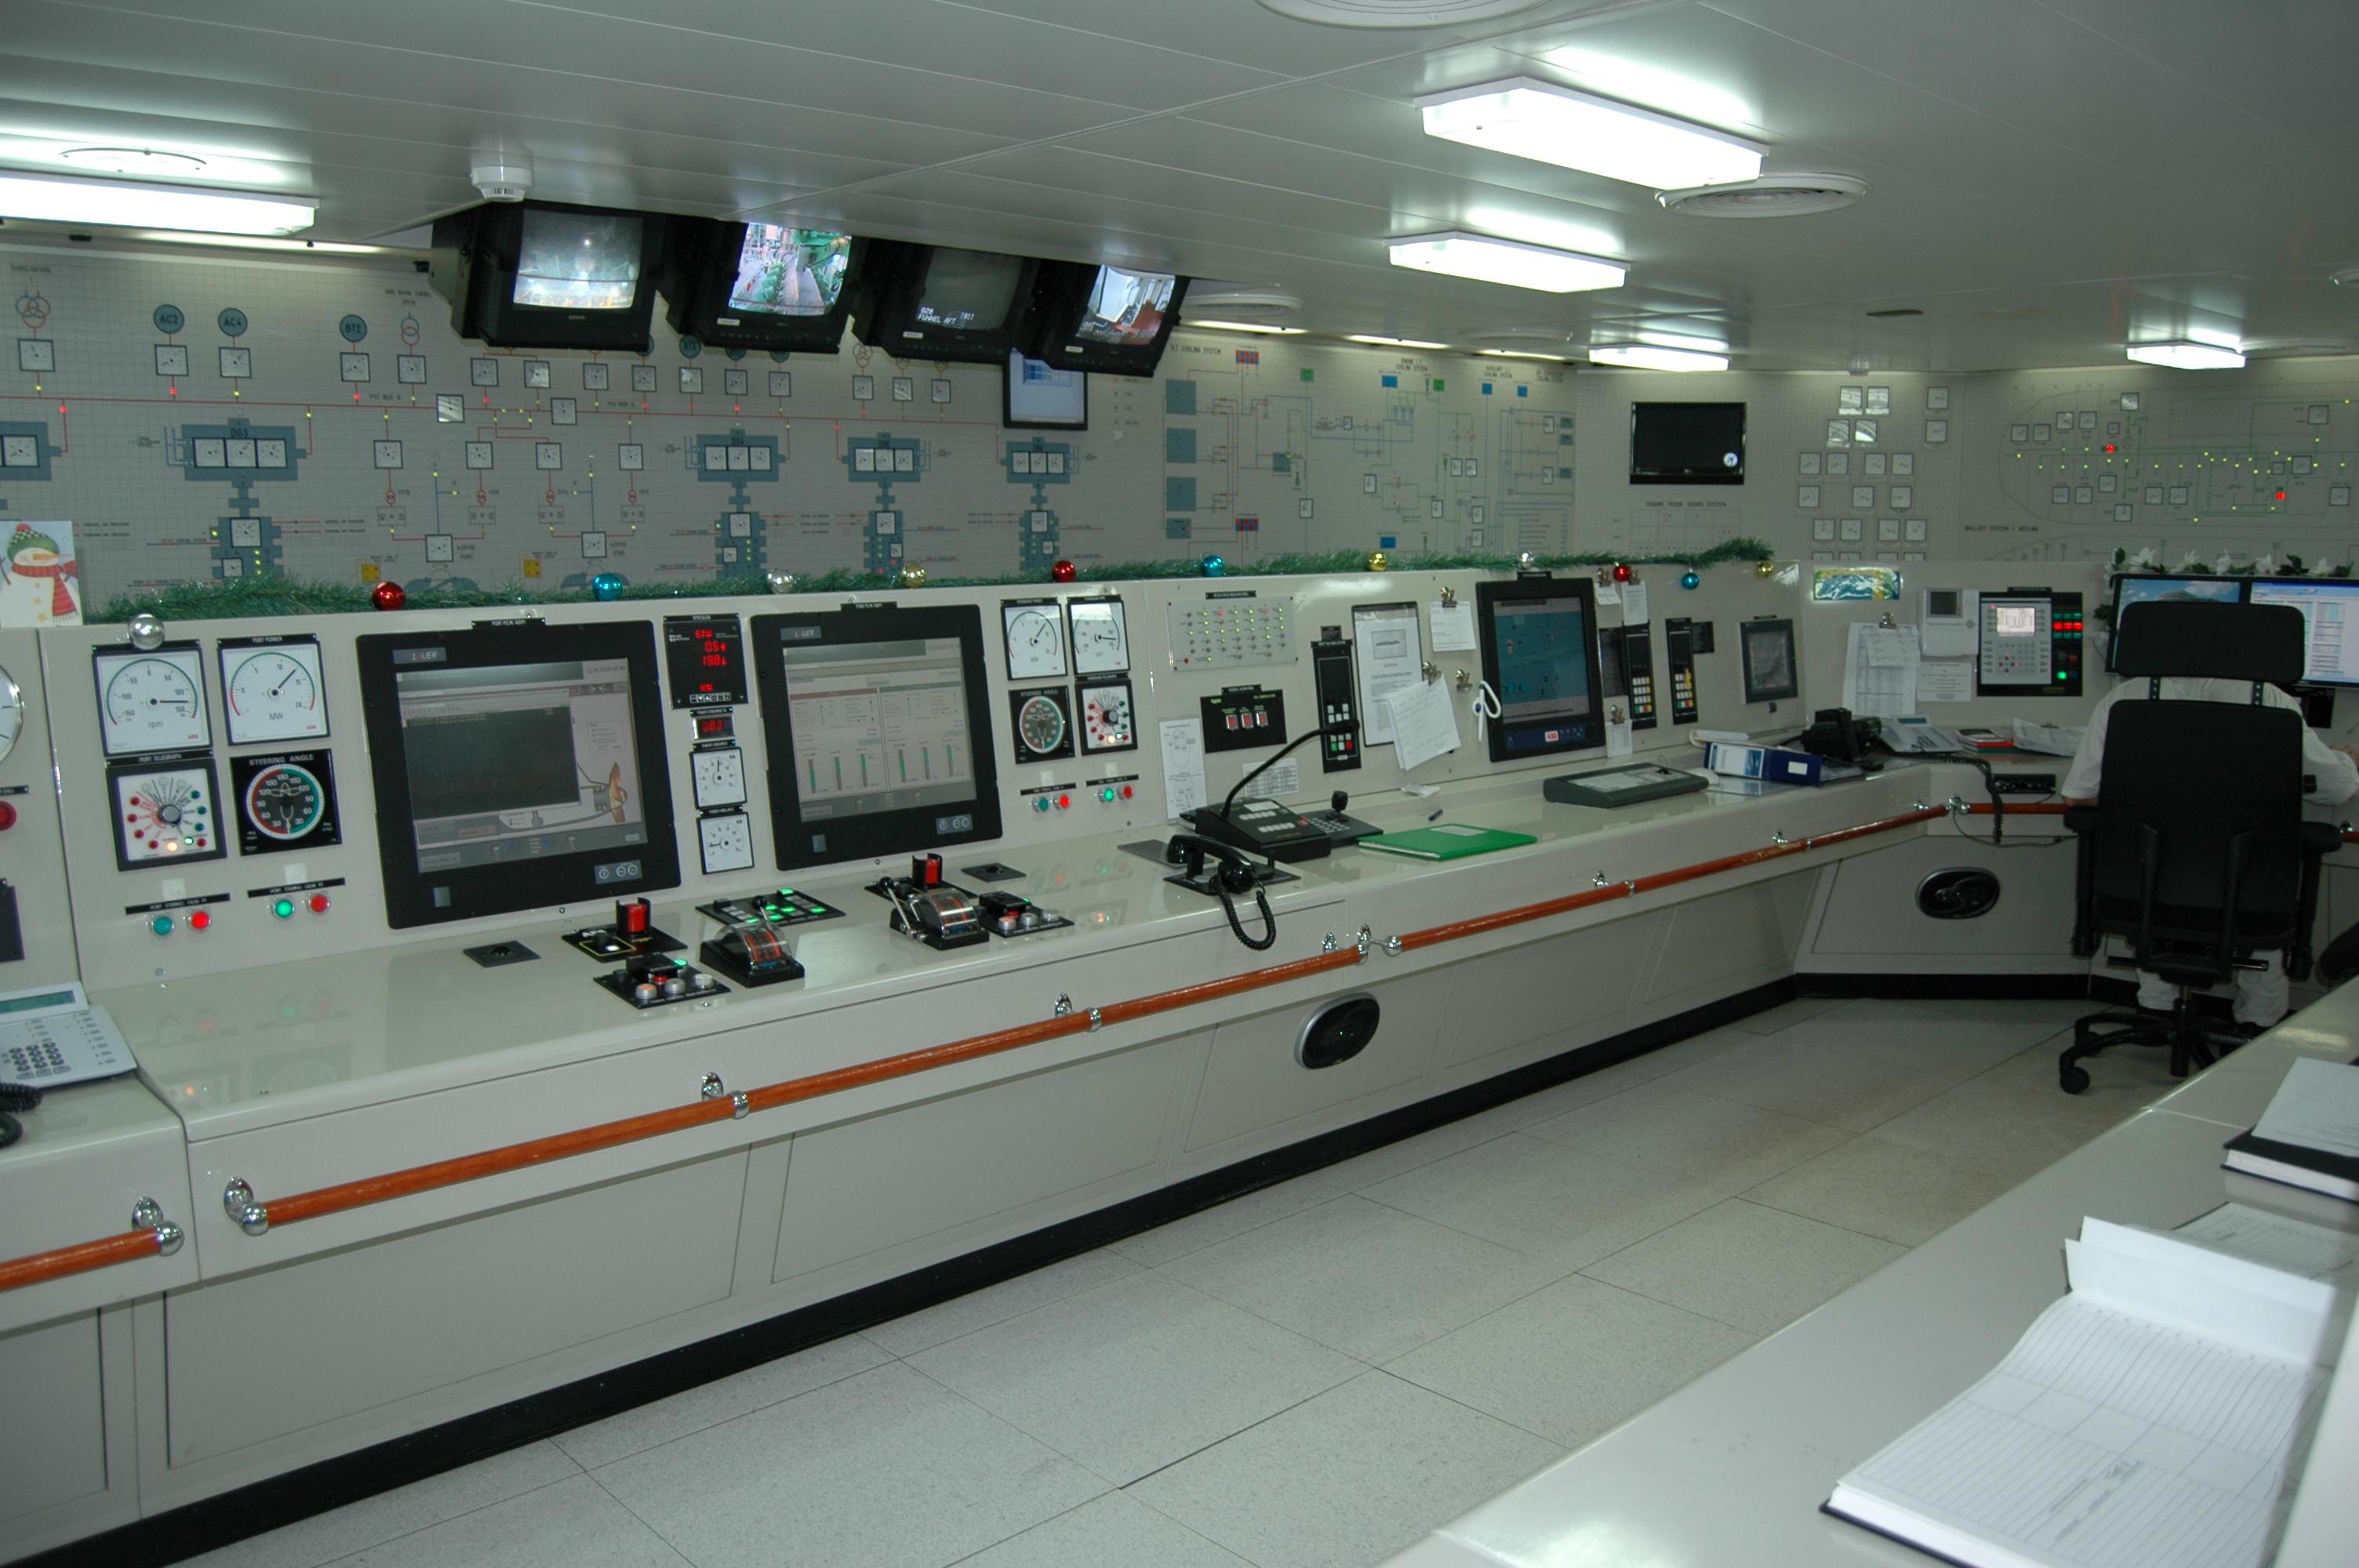 engineer_control_room_pontoporos_nautilia_